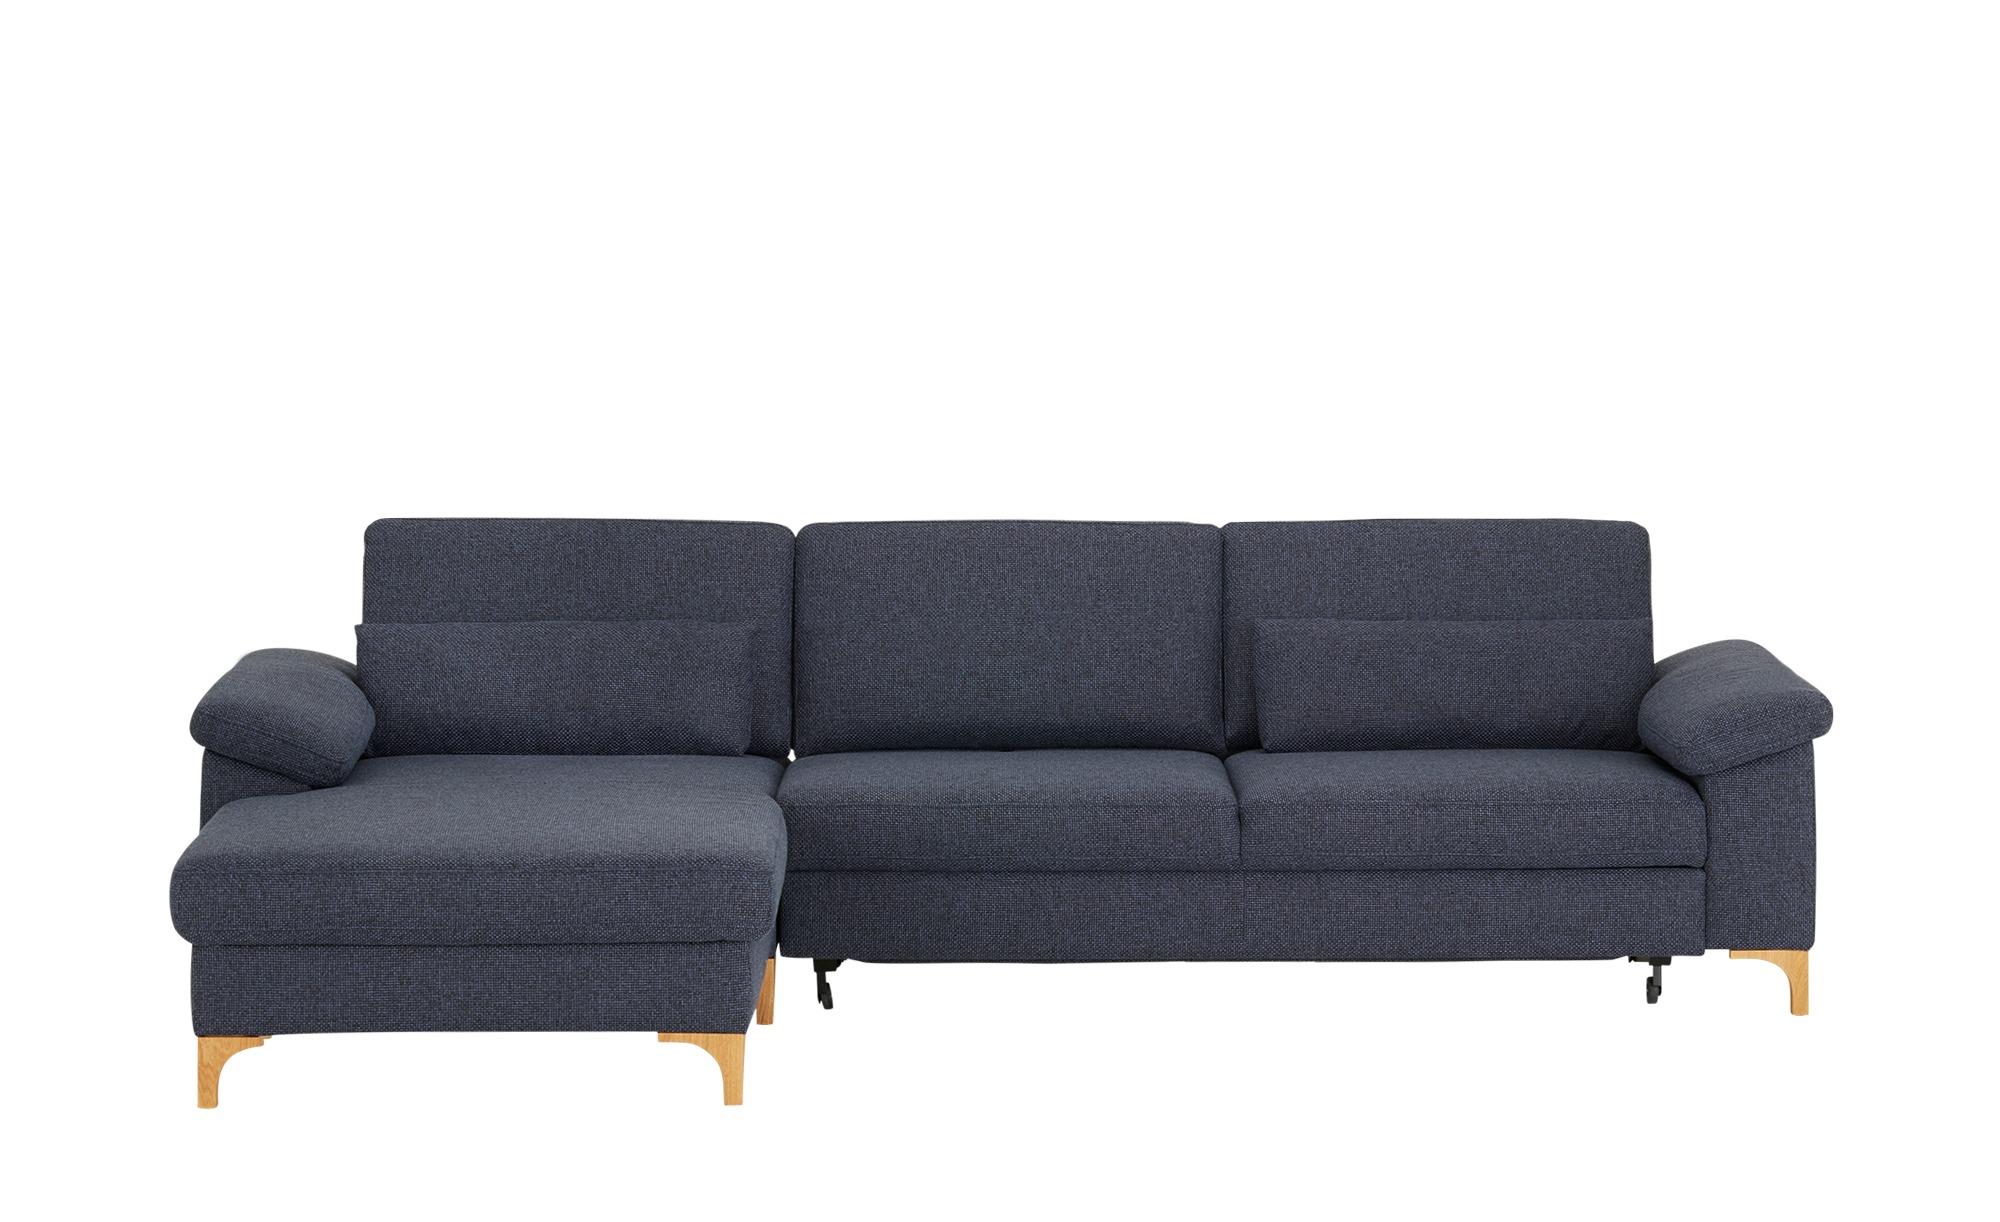 Max Schelling Ecksofa  Maximum Move ¦ blau ¦ Maße (cm): H: 82 Polstermöbel > Sofas > Ecksofas - Höffner